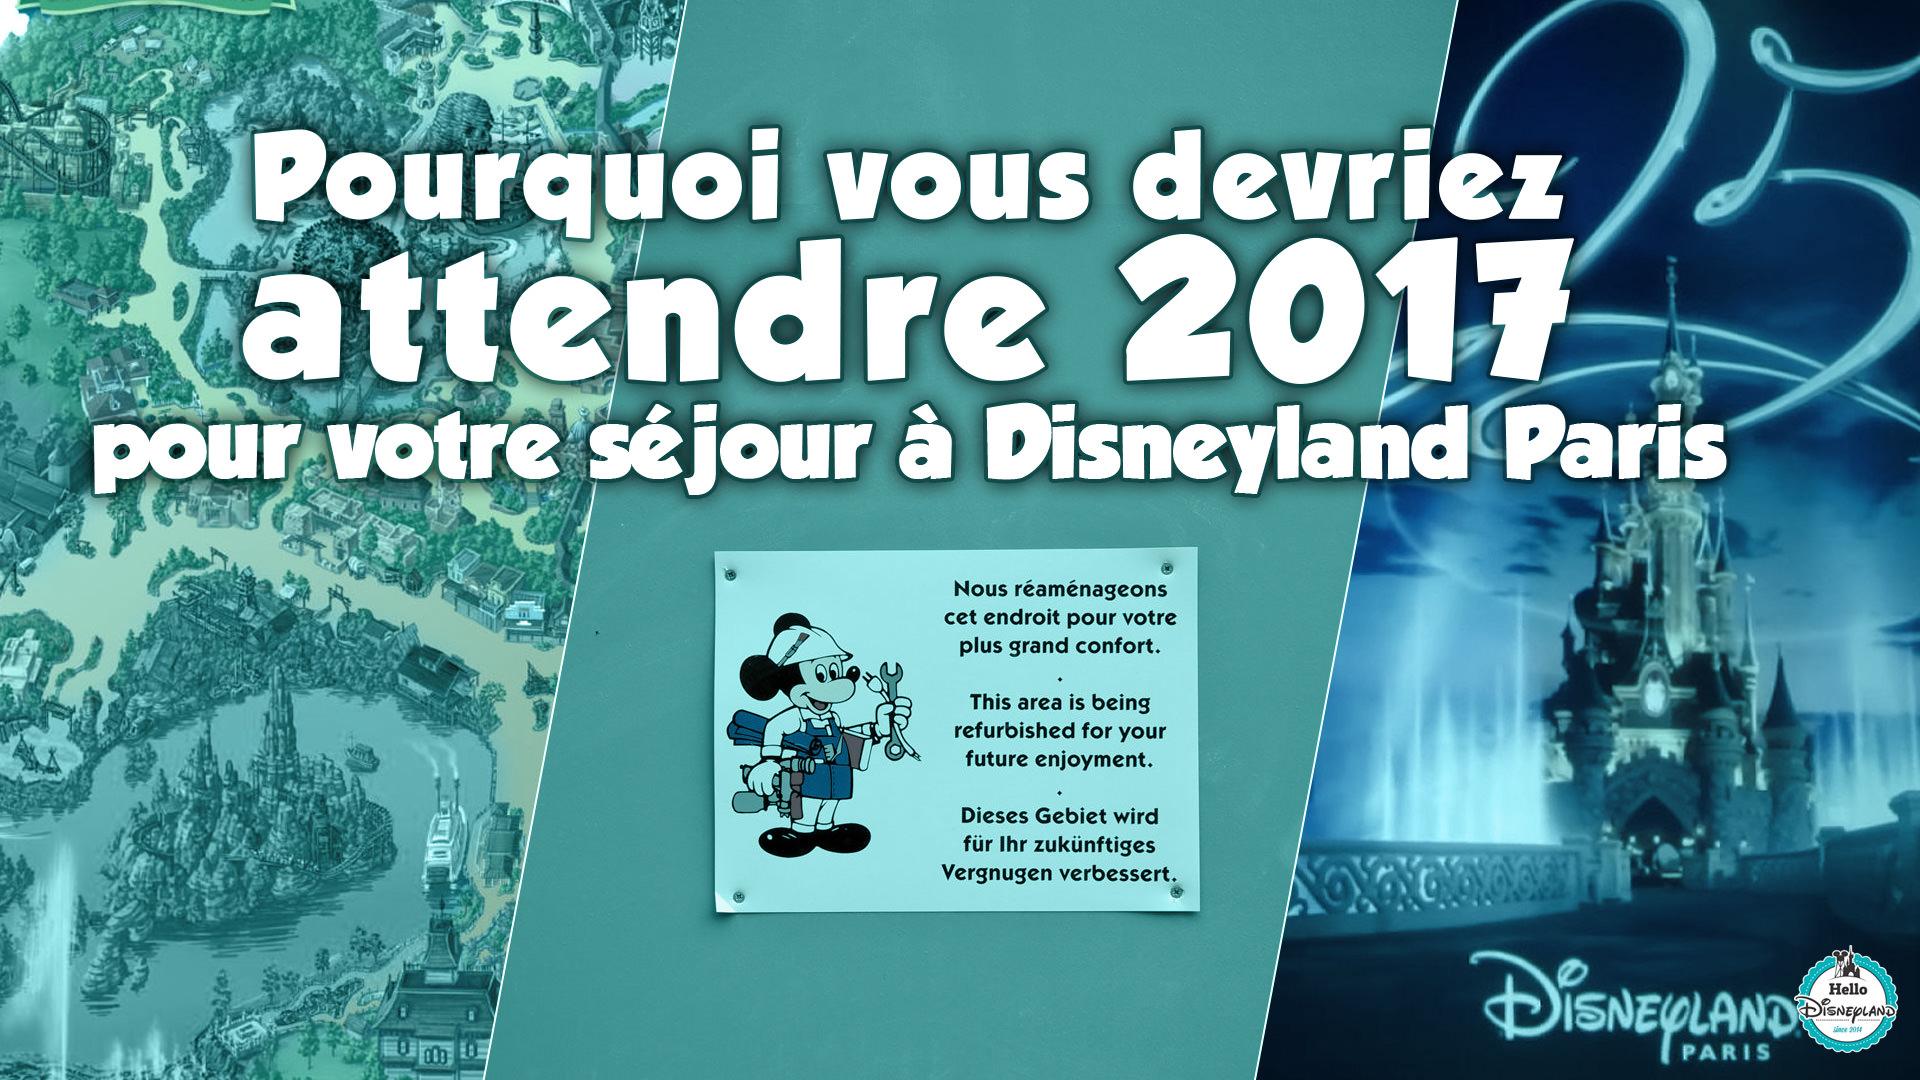 hellodisneyland.com/wp-content/uploads/2016/04/travaux-disneyland-paris-2016-2017.jpg